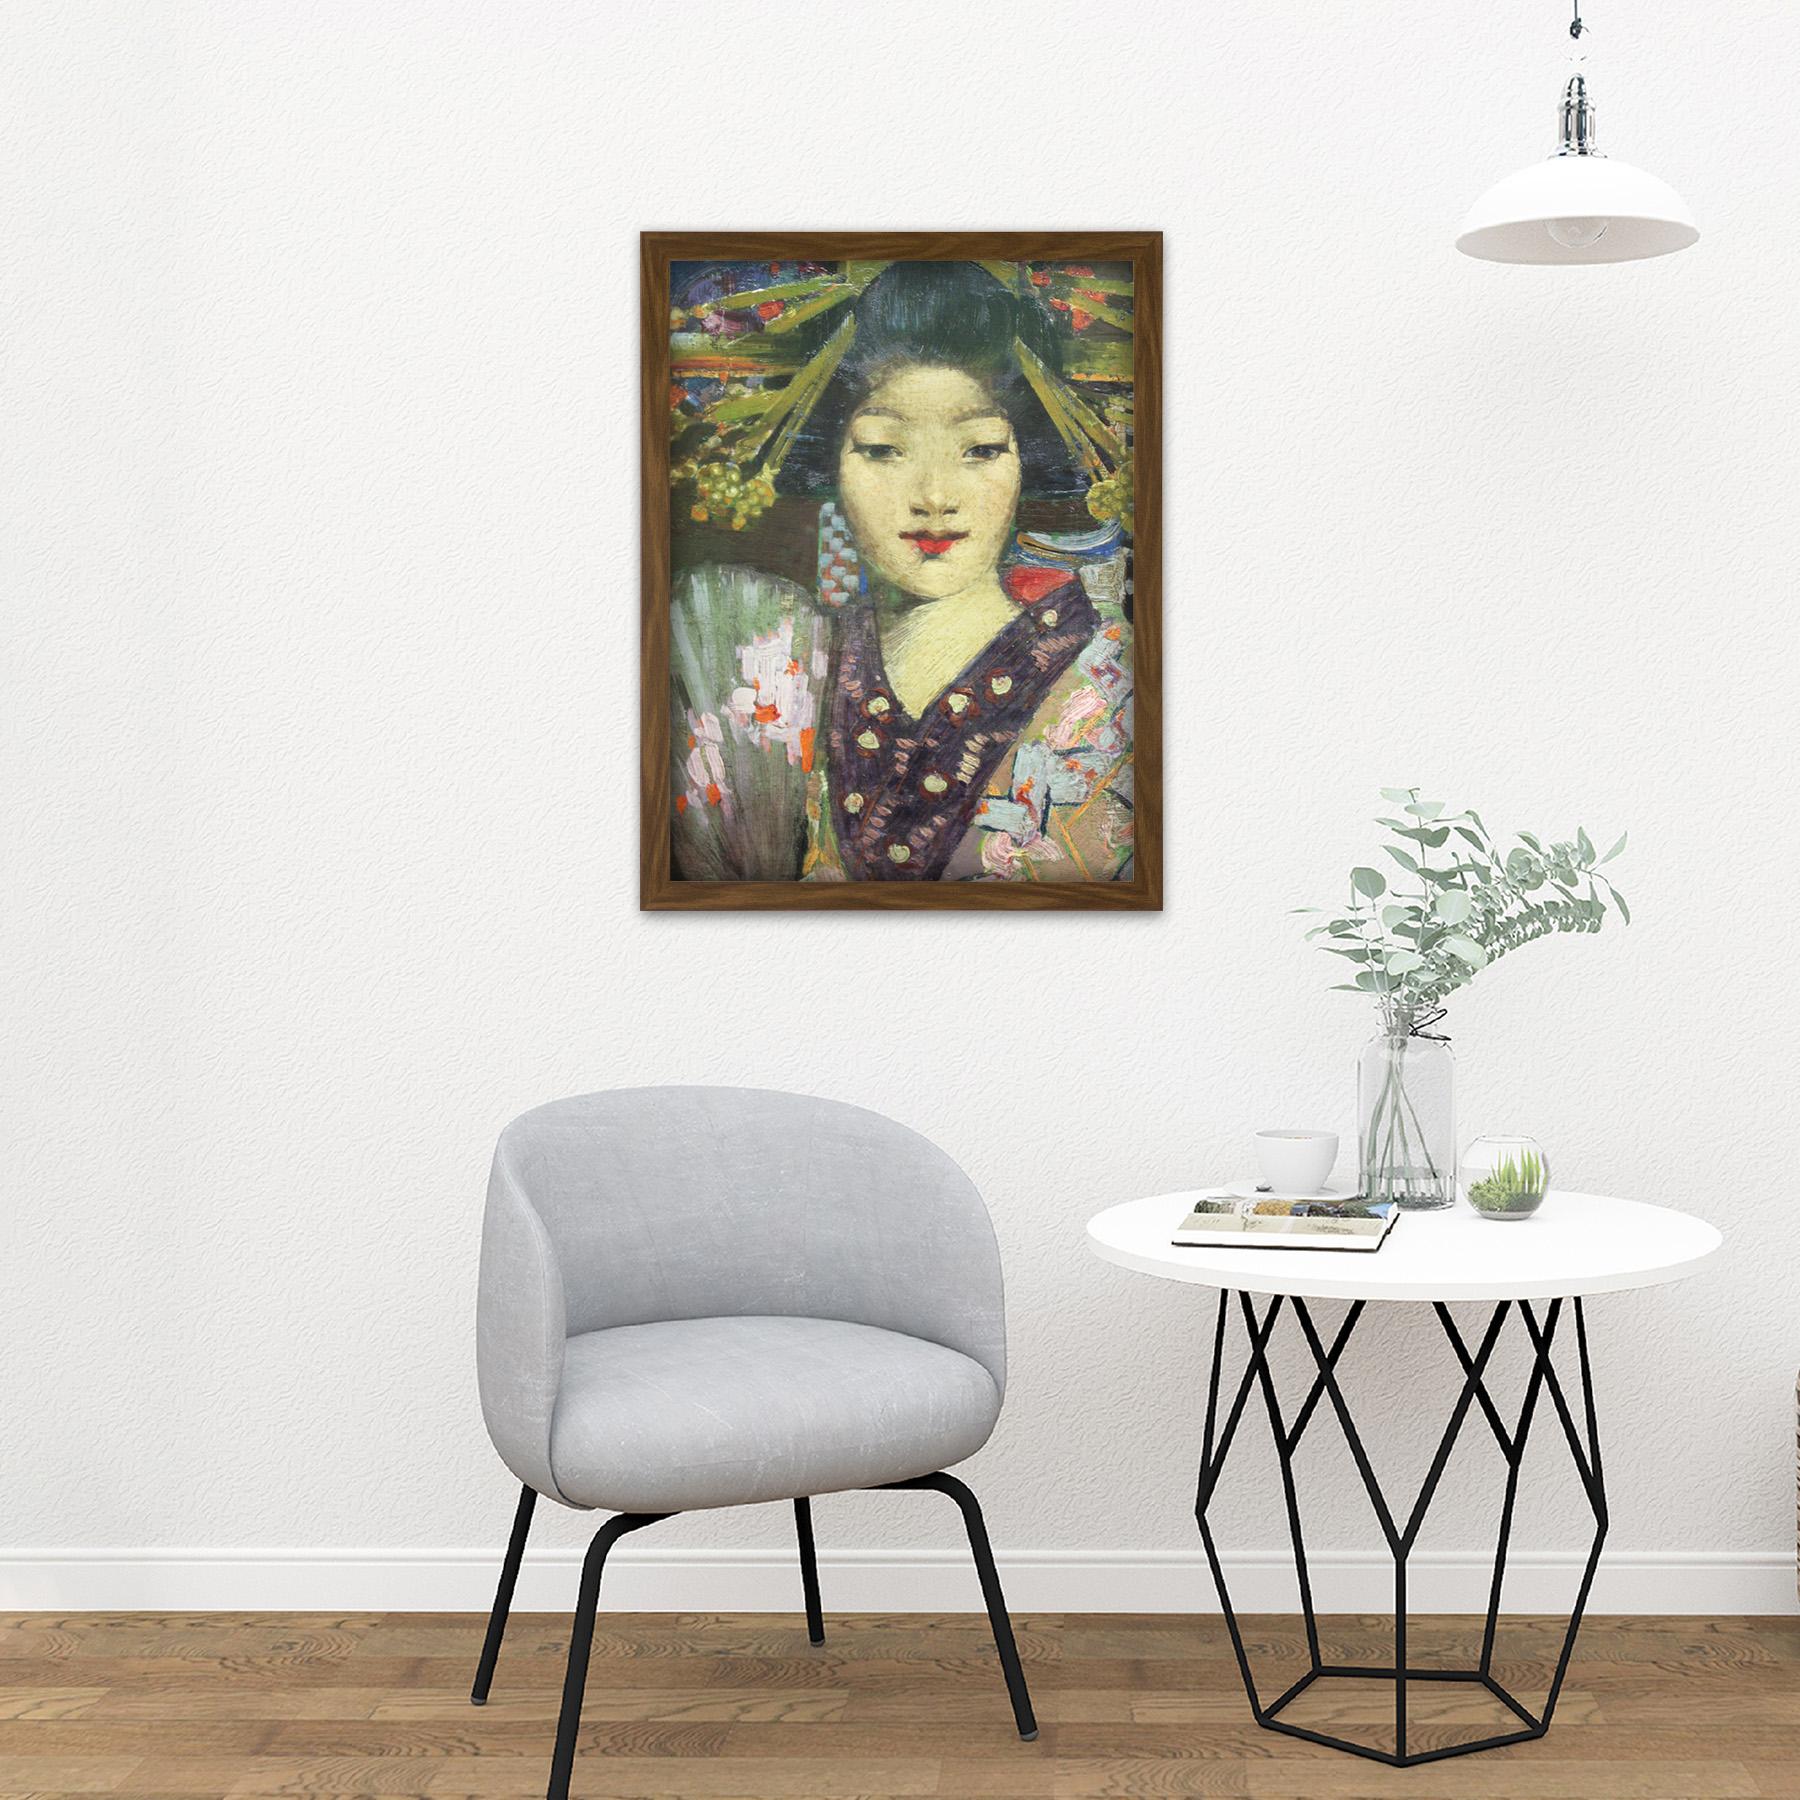 Henry-Geisha-Girl-Detail-Painting-Large-Framed-Art-Print thumbnail 13